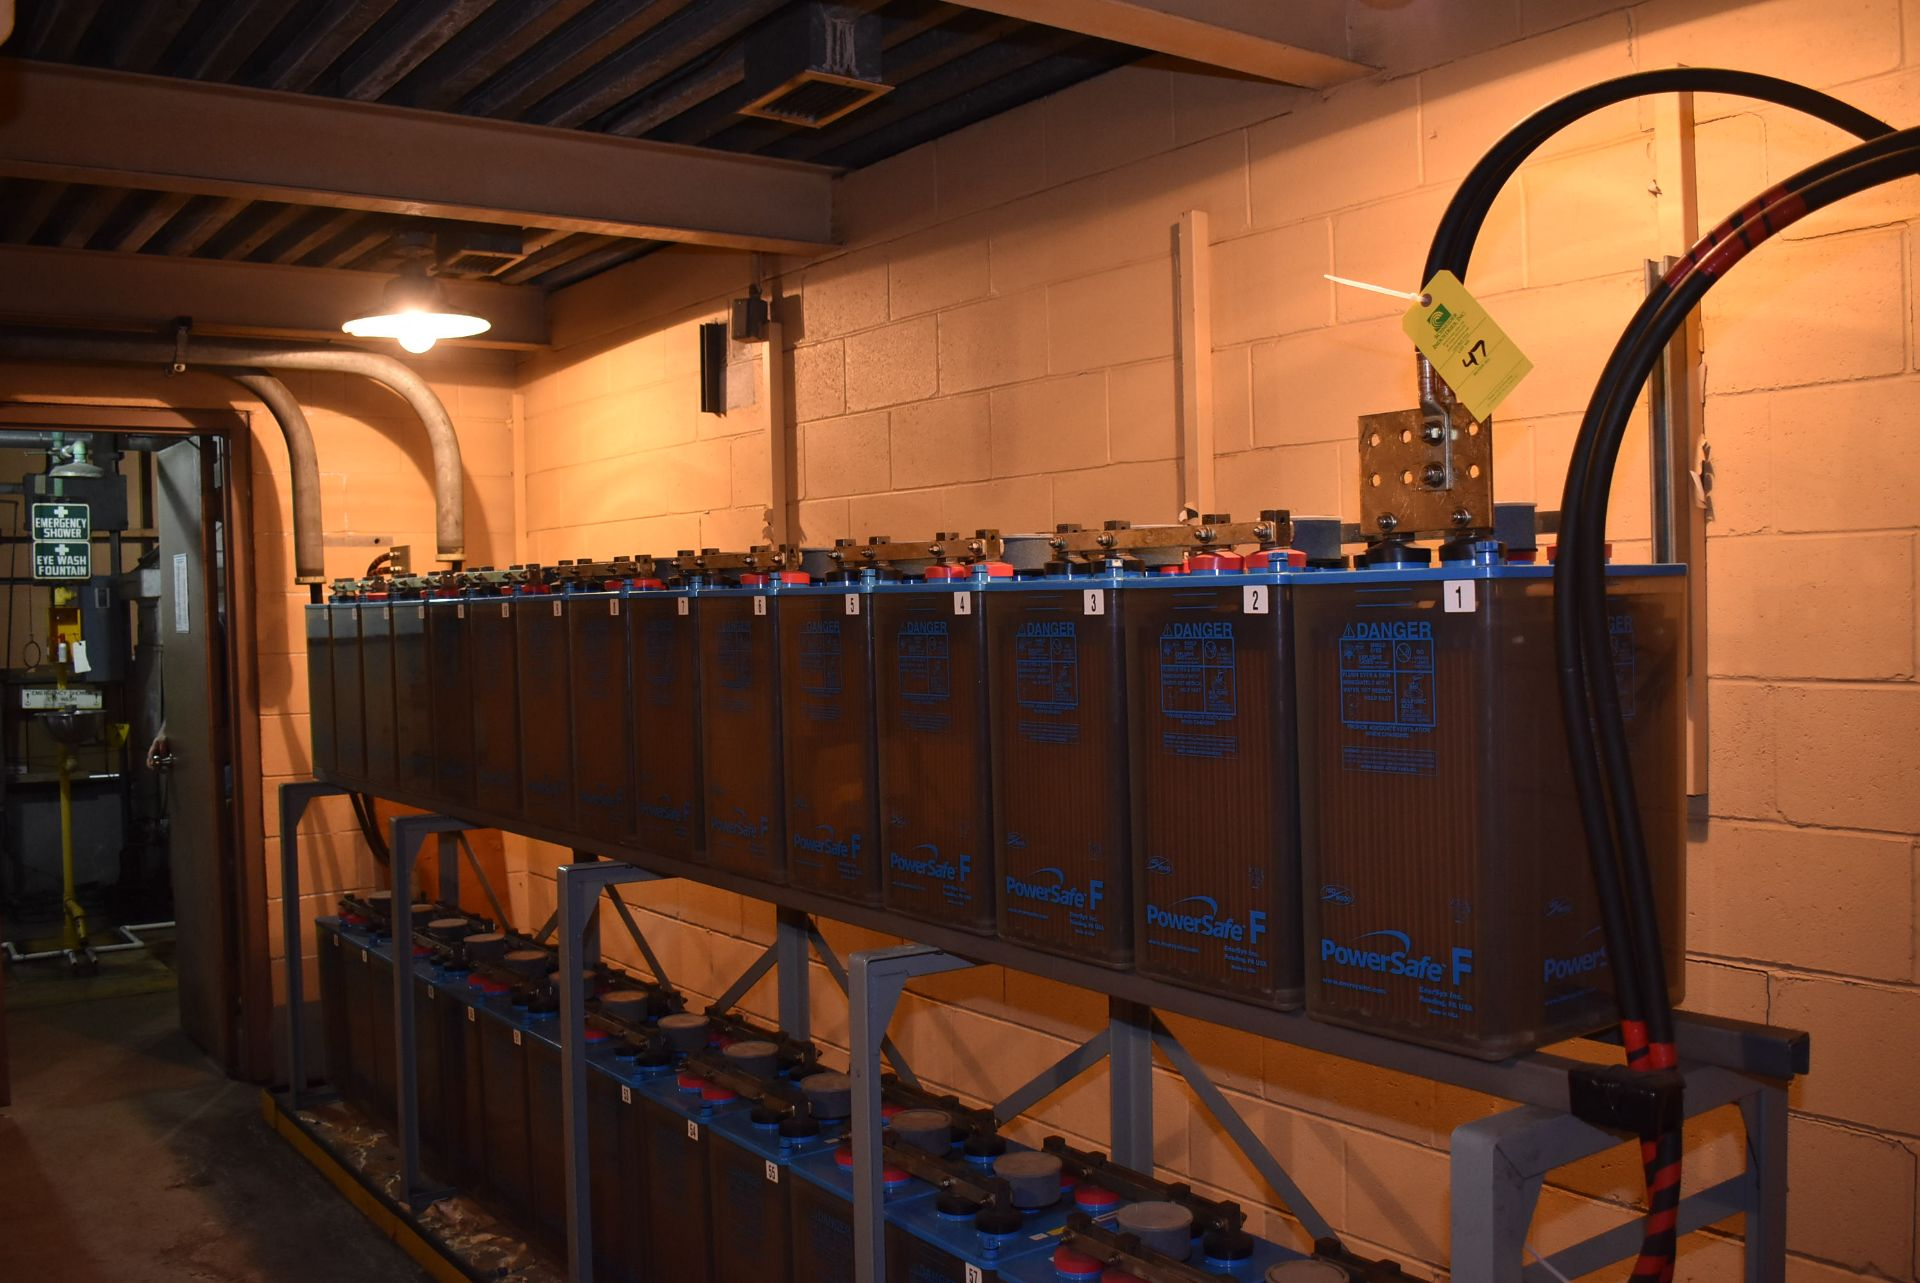 Lot 47 - 2011 Power Safe Type FTA-21P Nom-Capacity 1680 Amps/HR (1-Bank of 15)